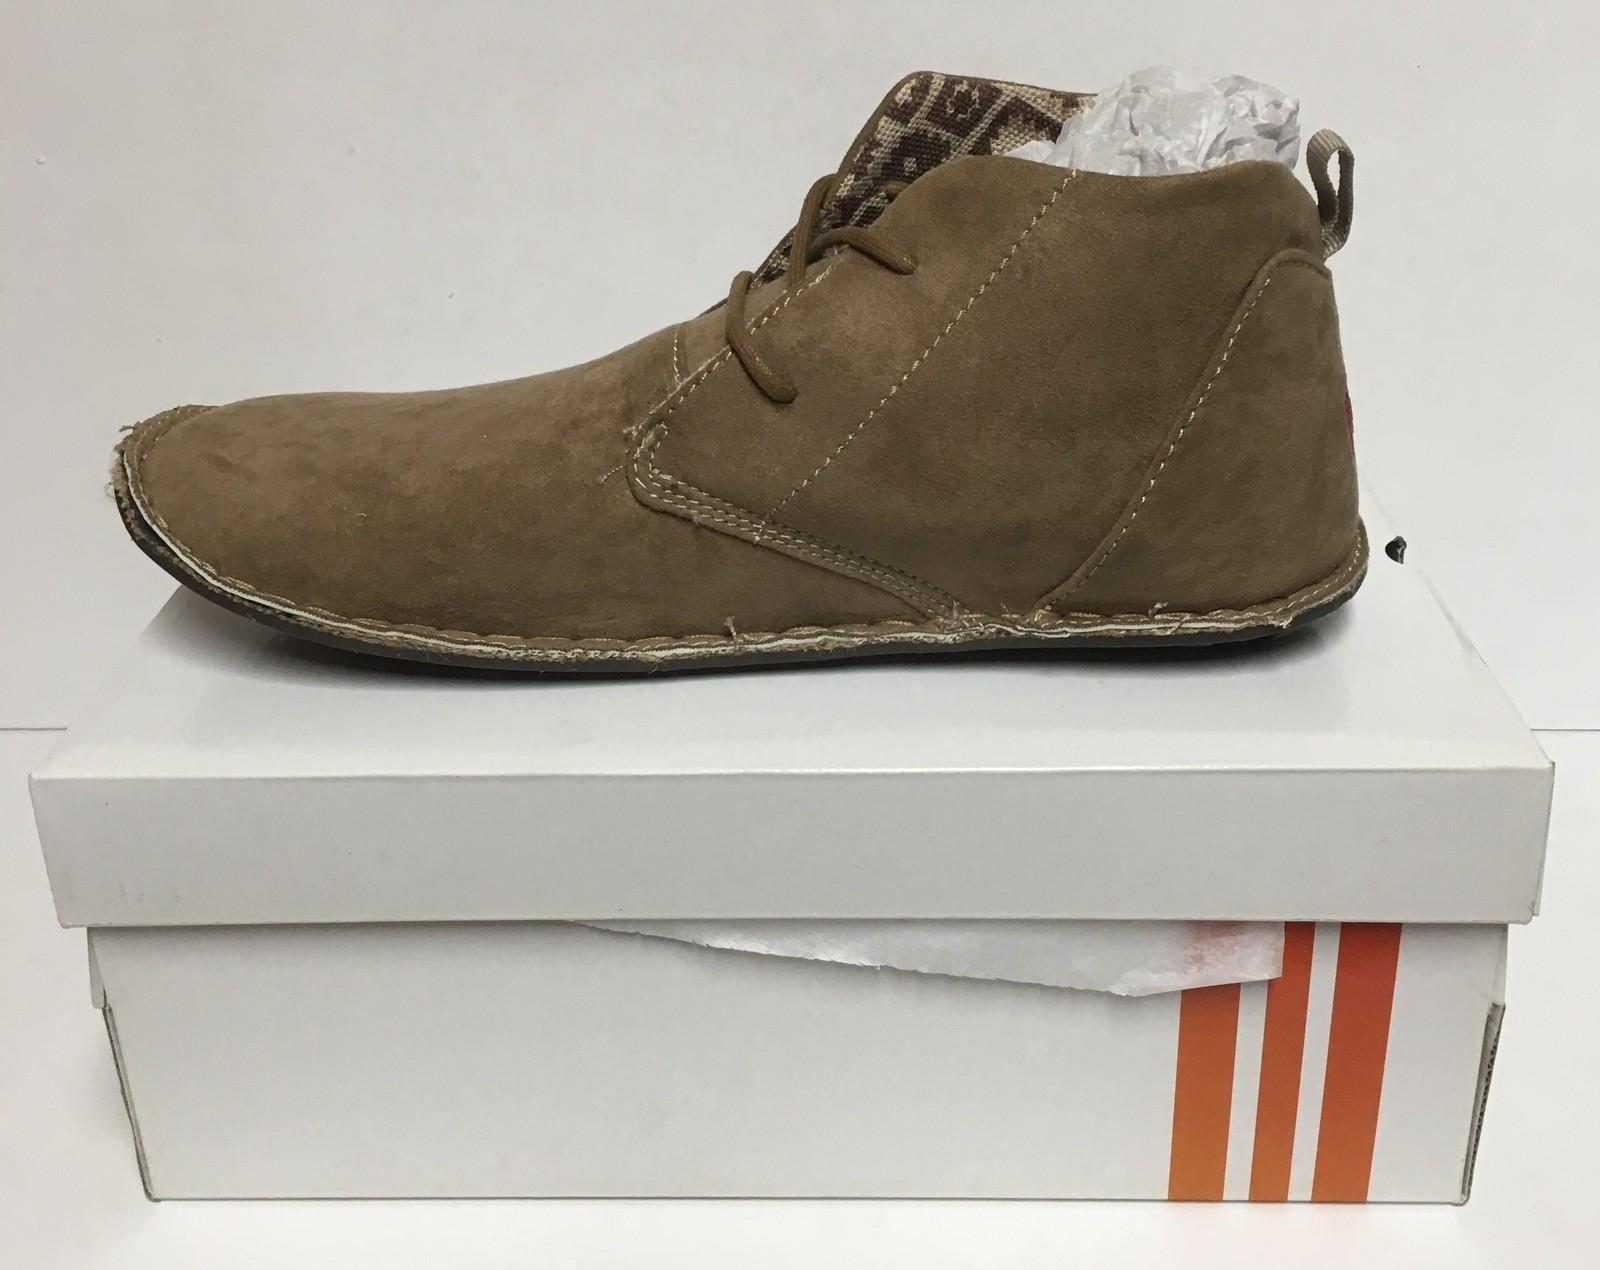 Ohio State University Men's Loafers Chuckka Shoes Sz 11 Tan